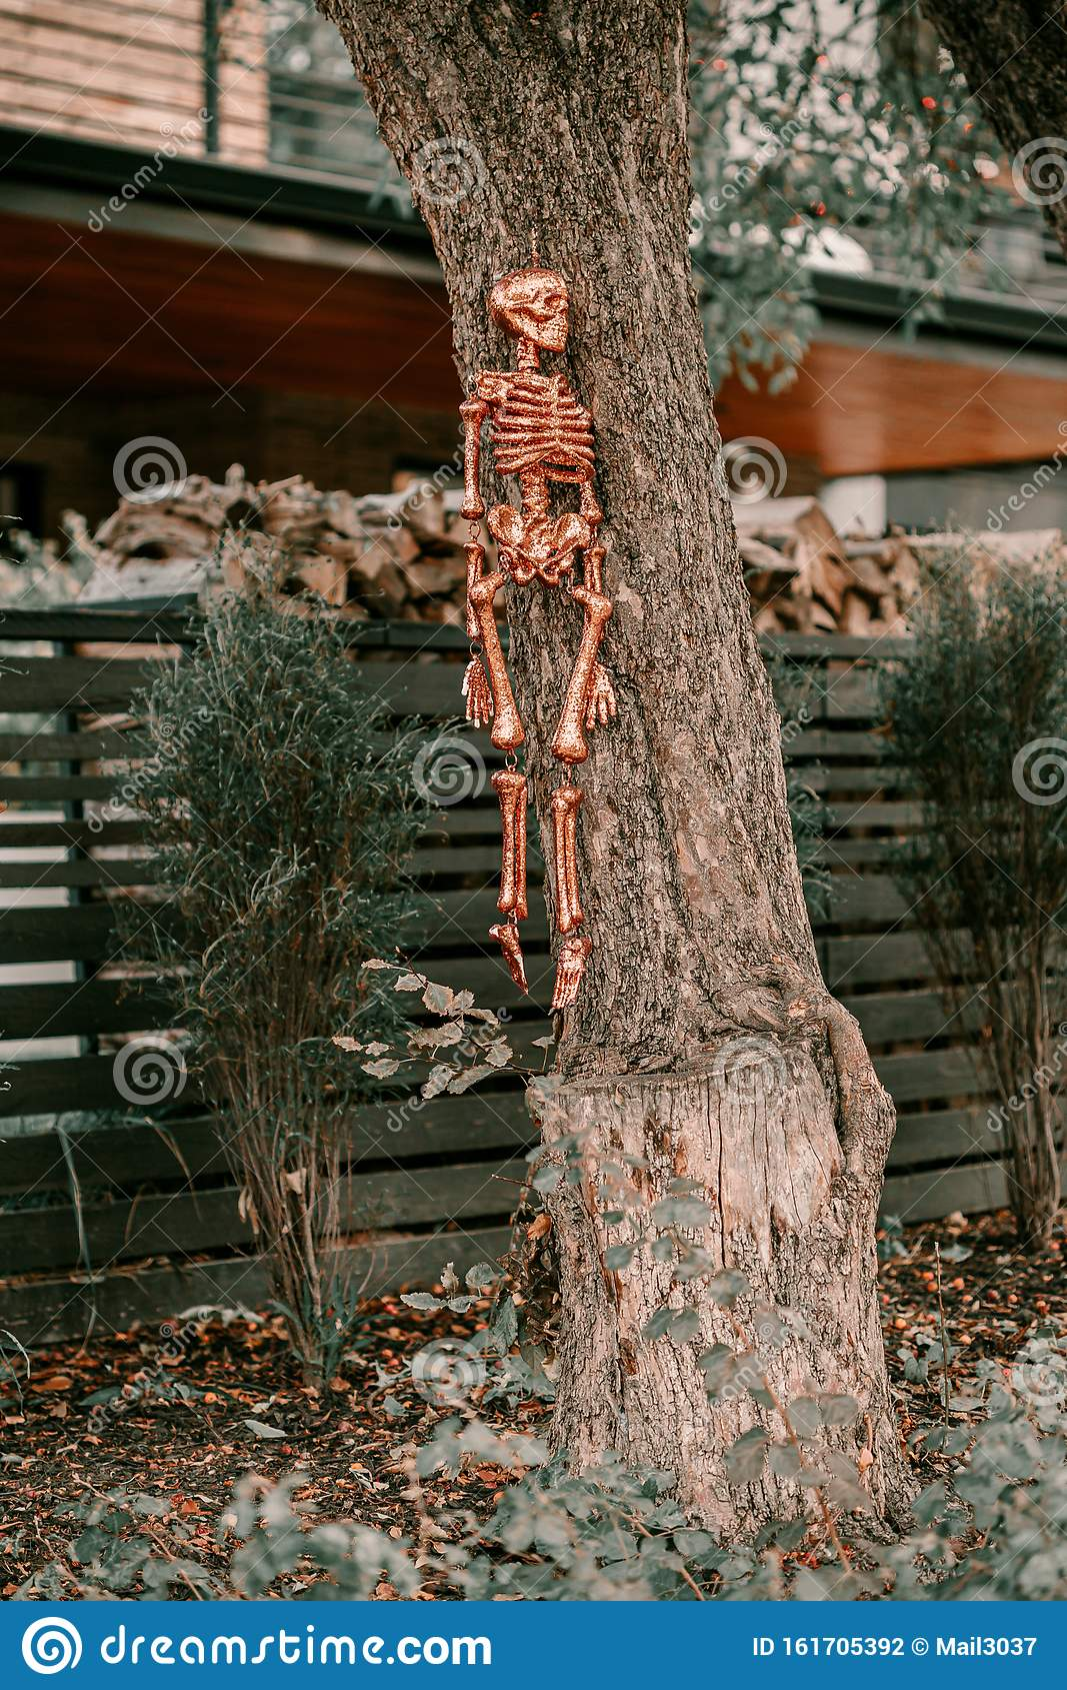 Scary Spooky Halloween House Decorations Halloween Season